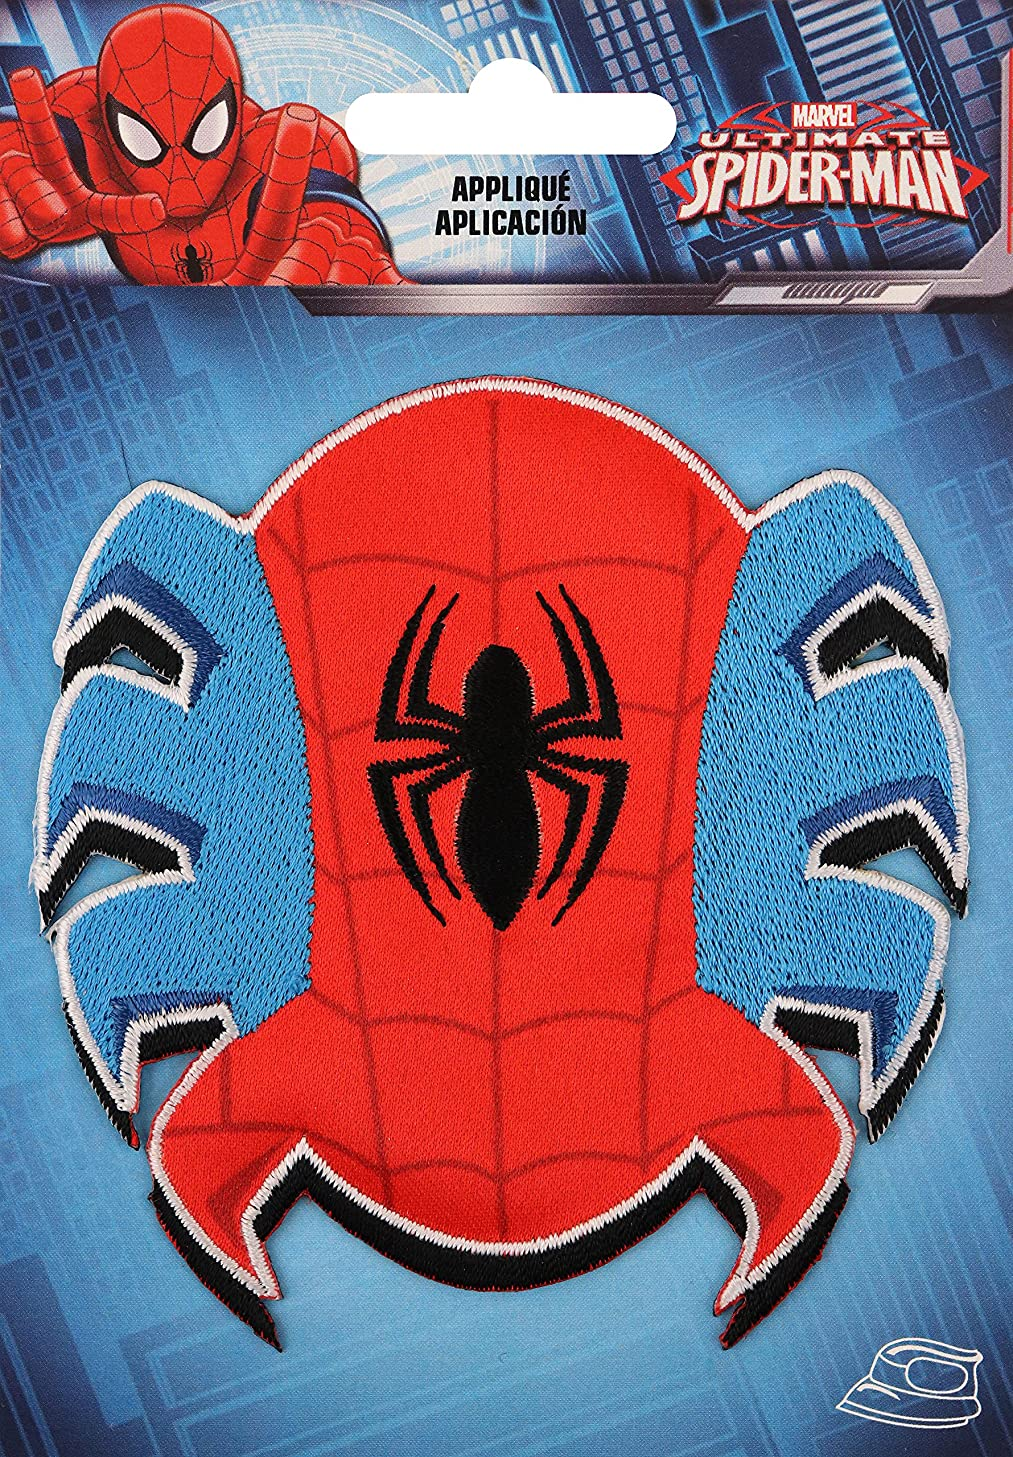 Wrights Spider-Man Crab Marvel Comics Iron-On Applique